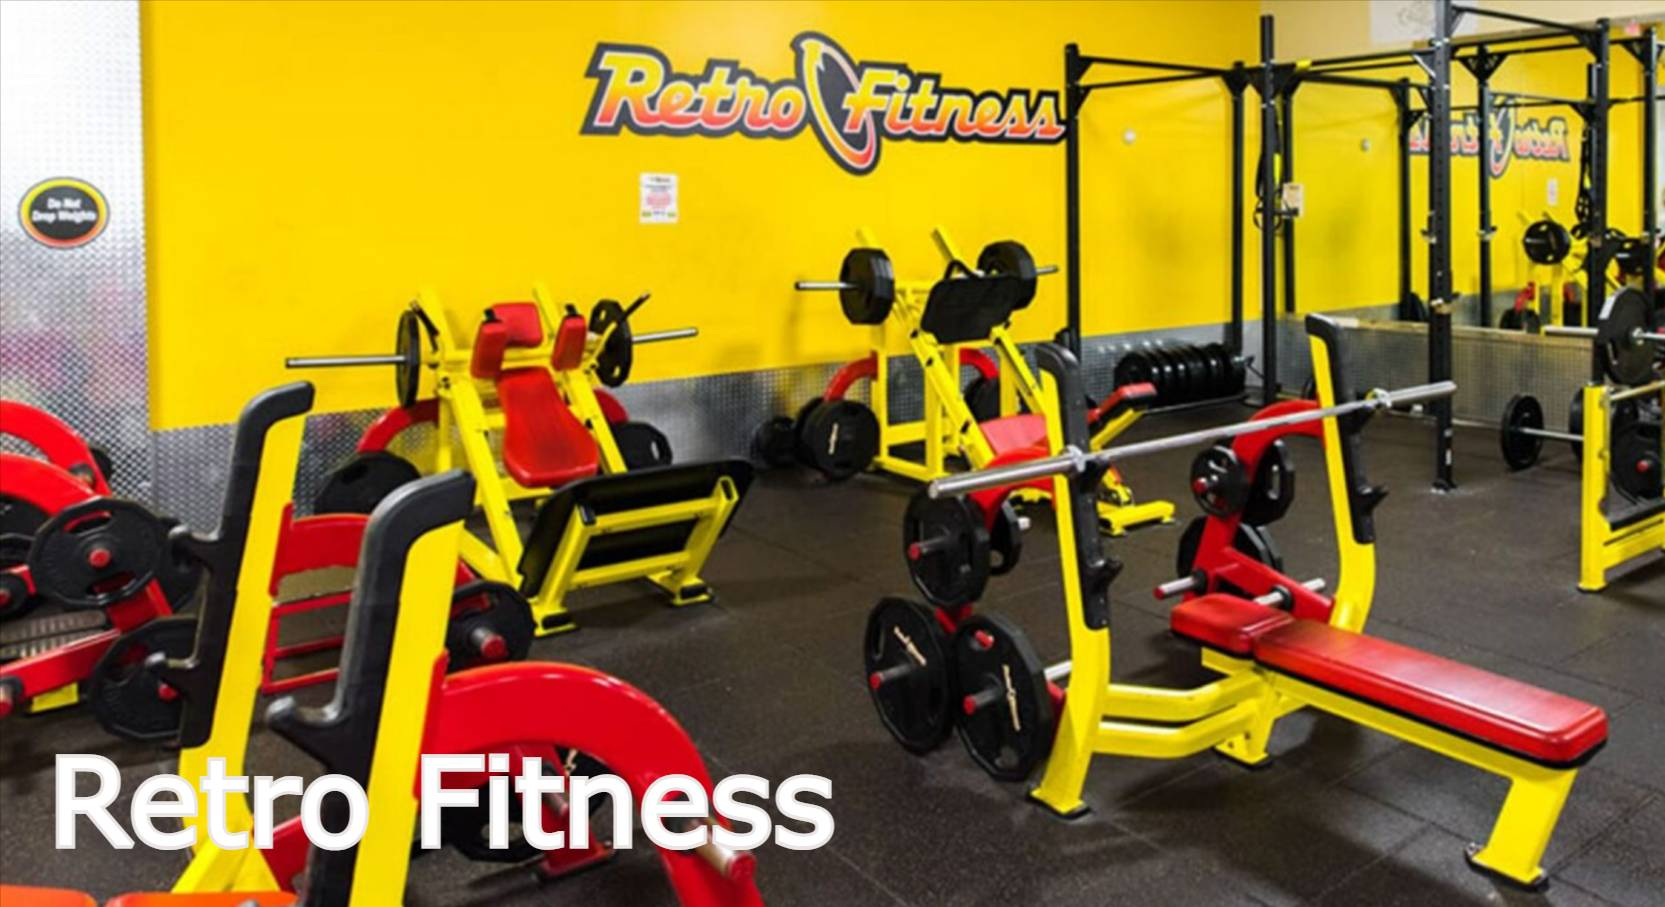 Retro-Fitness-Hours-Locations-Prices